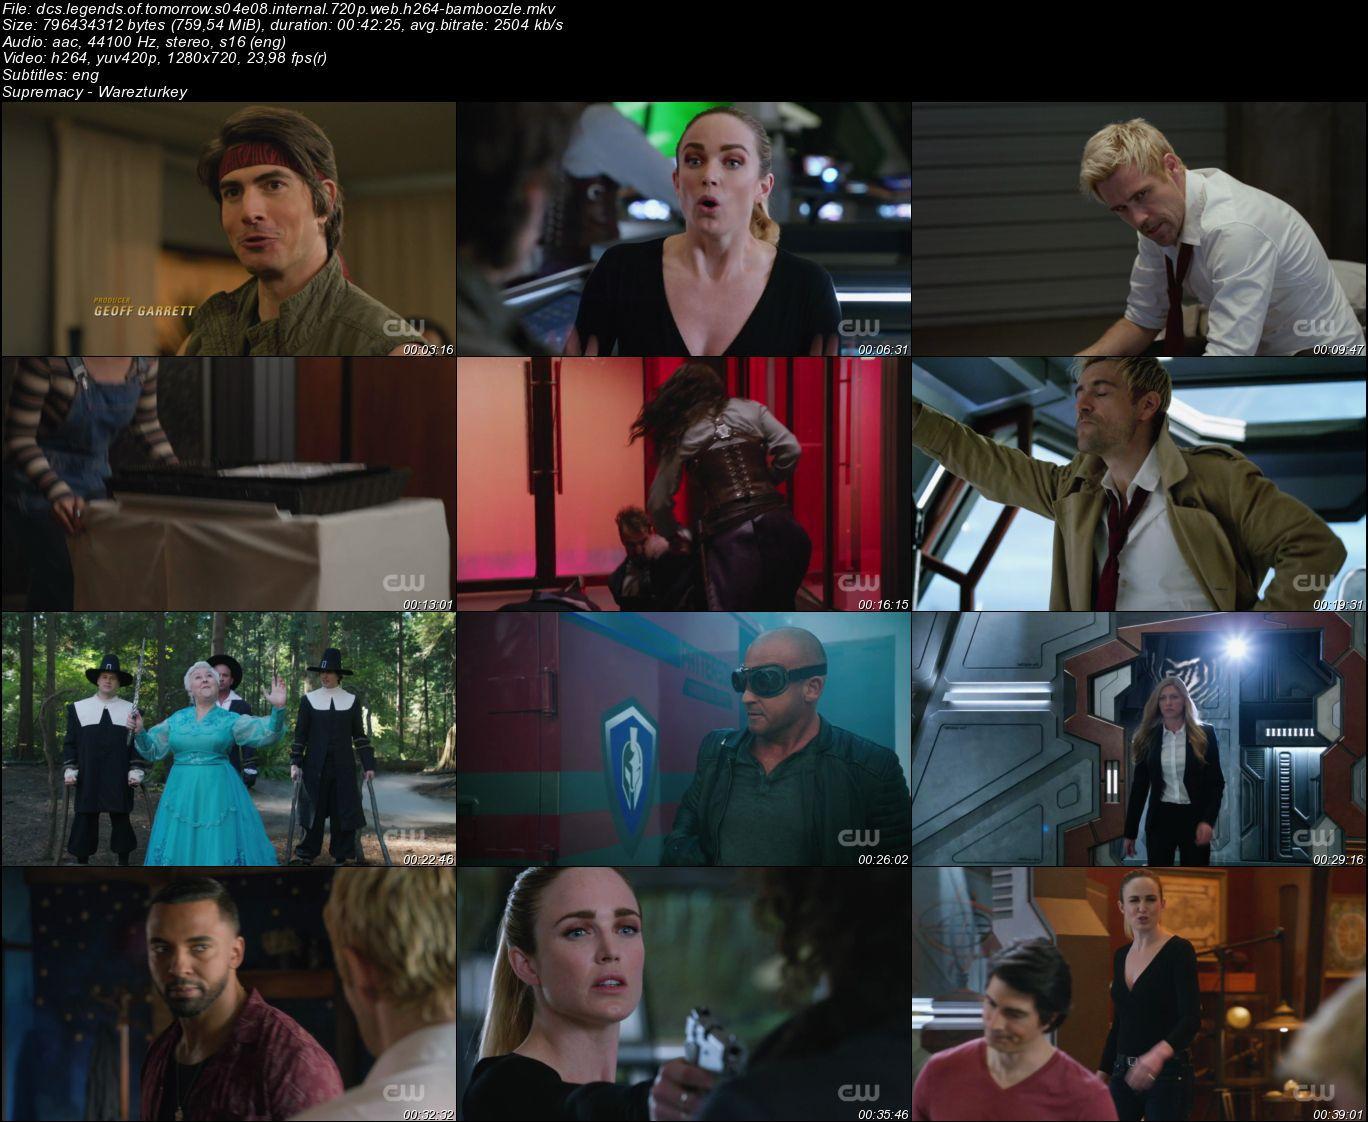 Legends of Tomorrow - Sezon 4 - 720p HDTV - Türkçe Altyazılı